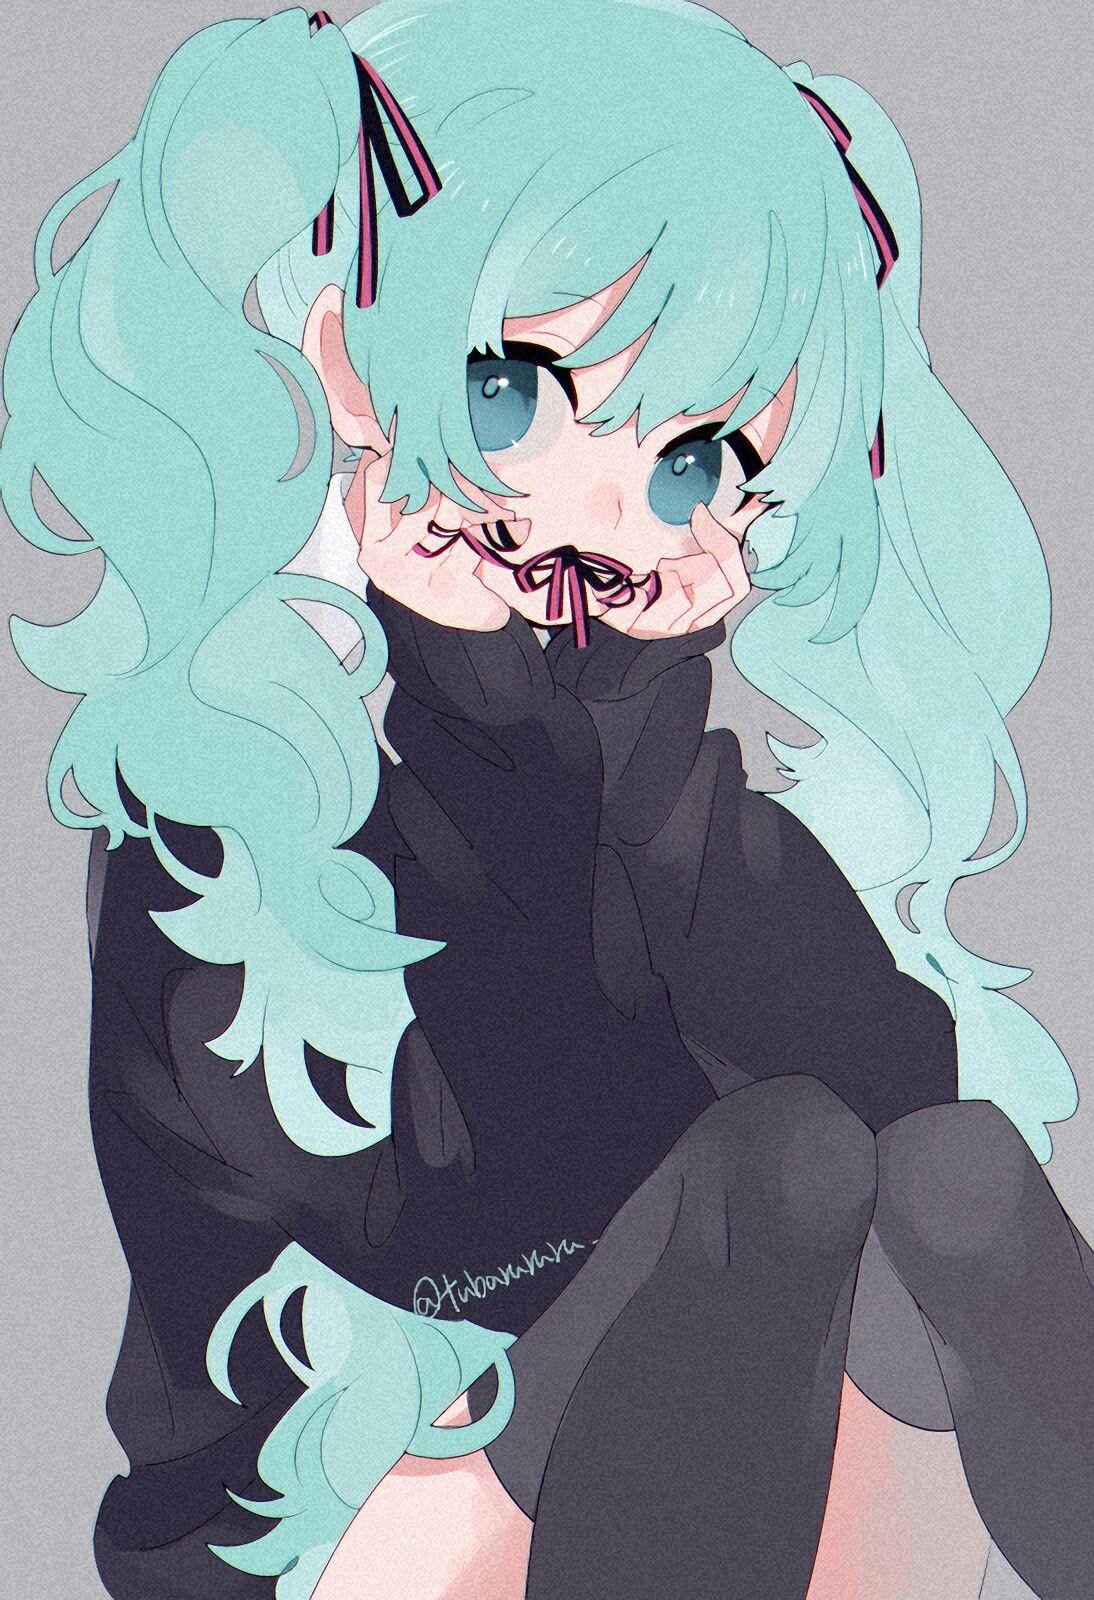 Hatsune miku anime art hatsune miku vocaloid anime art - Cute anime miku ...